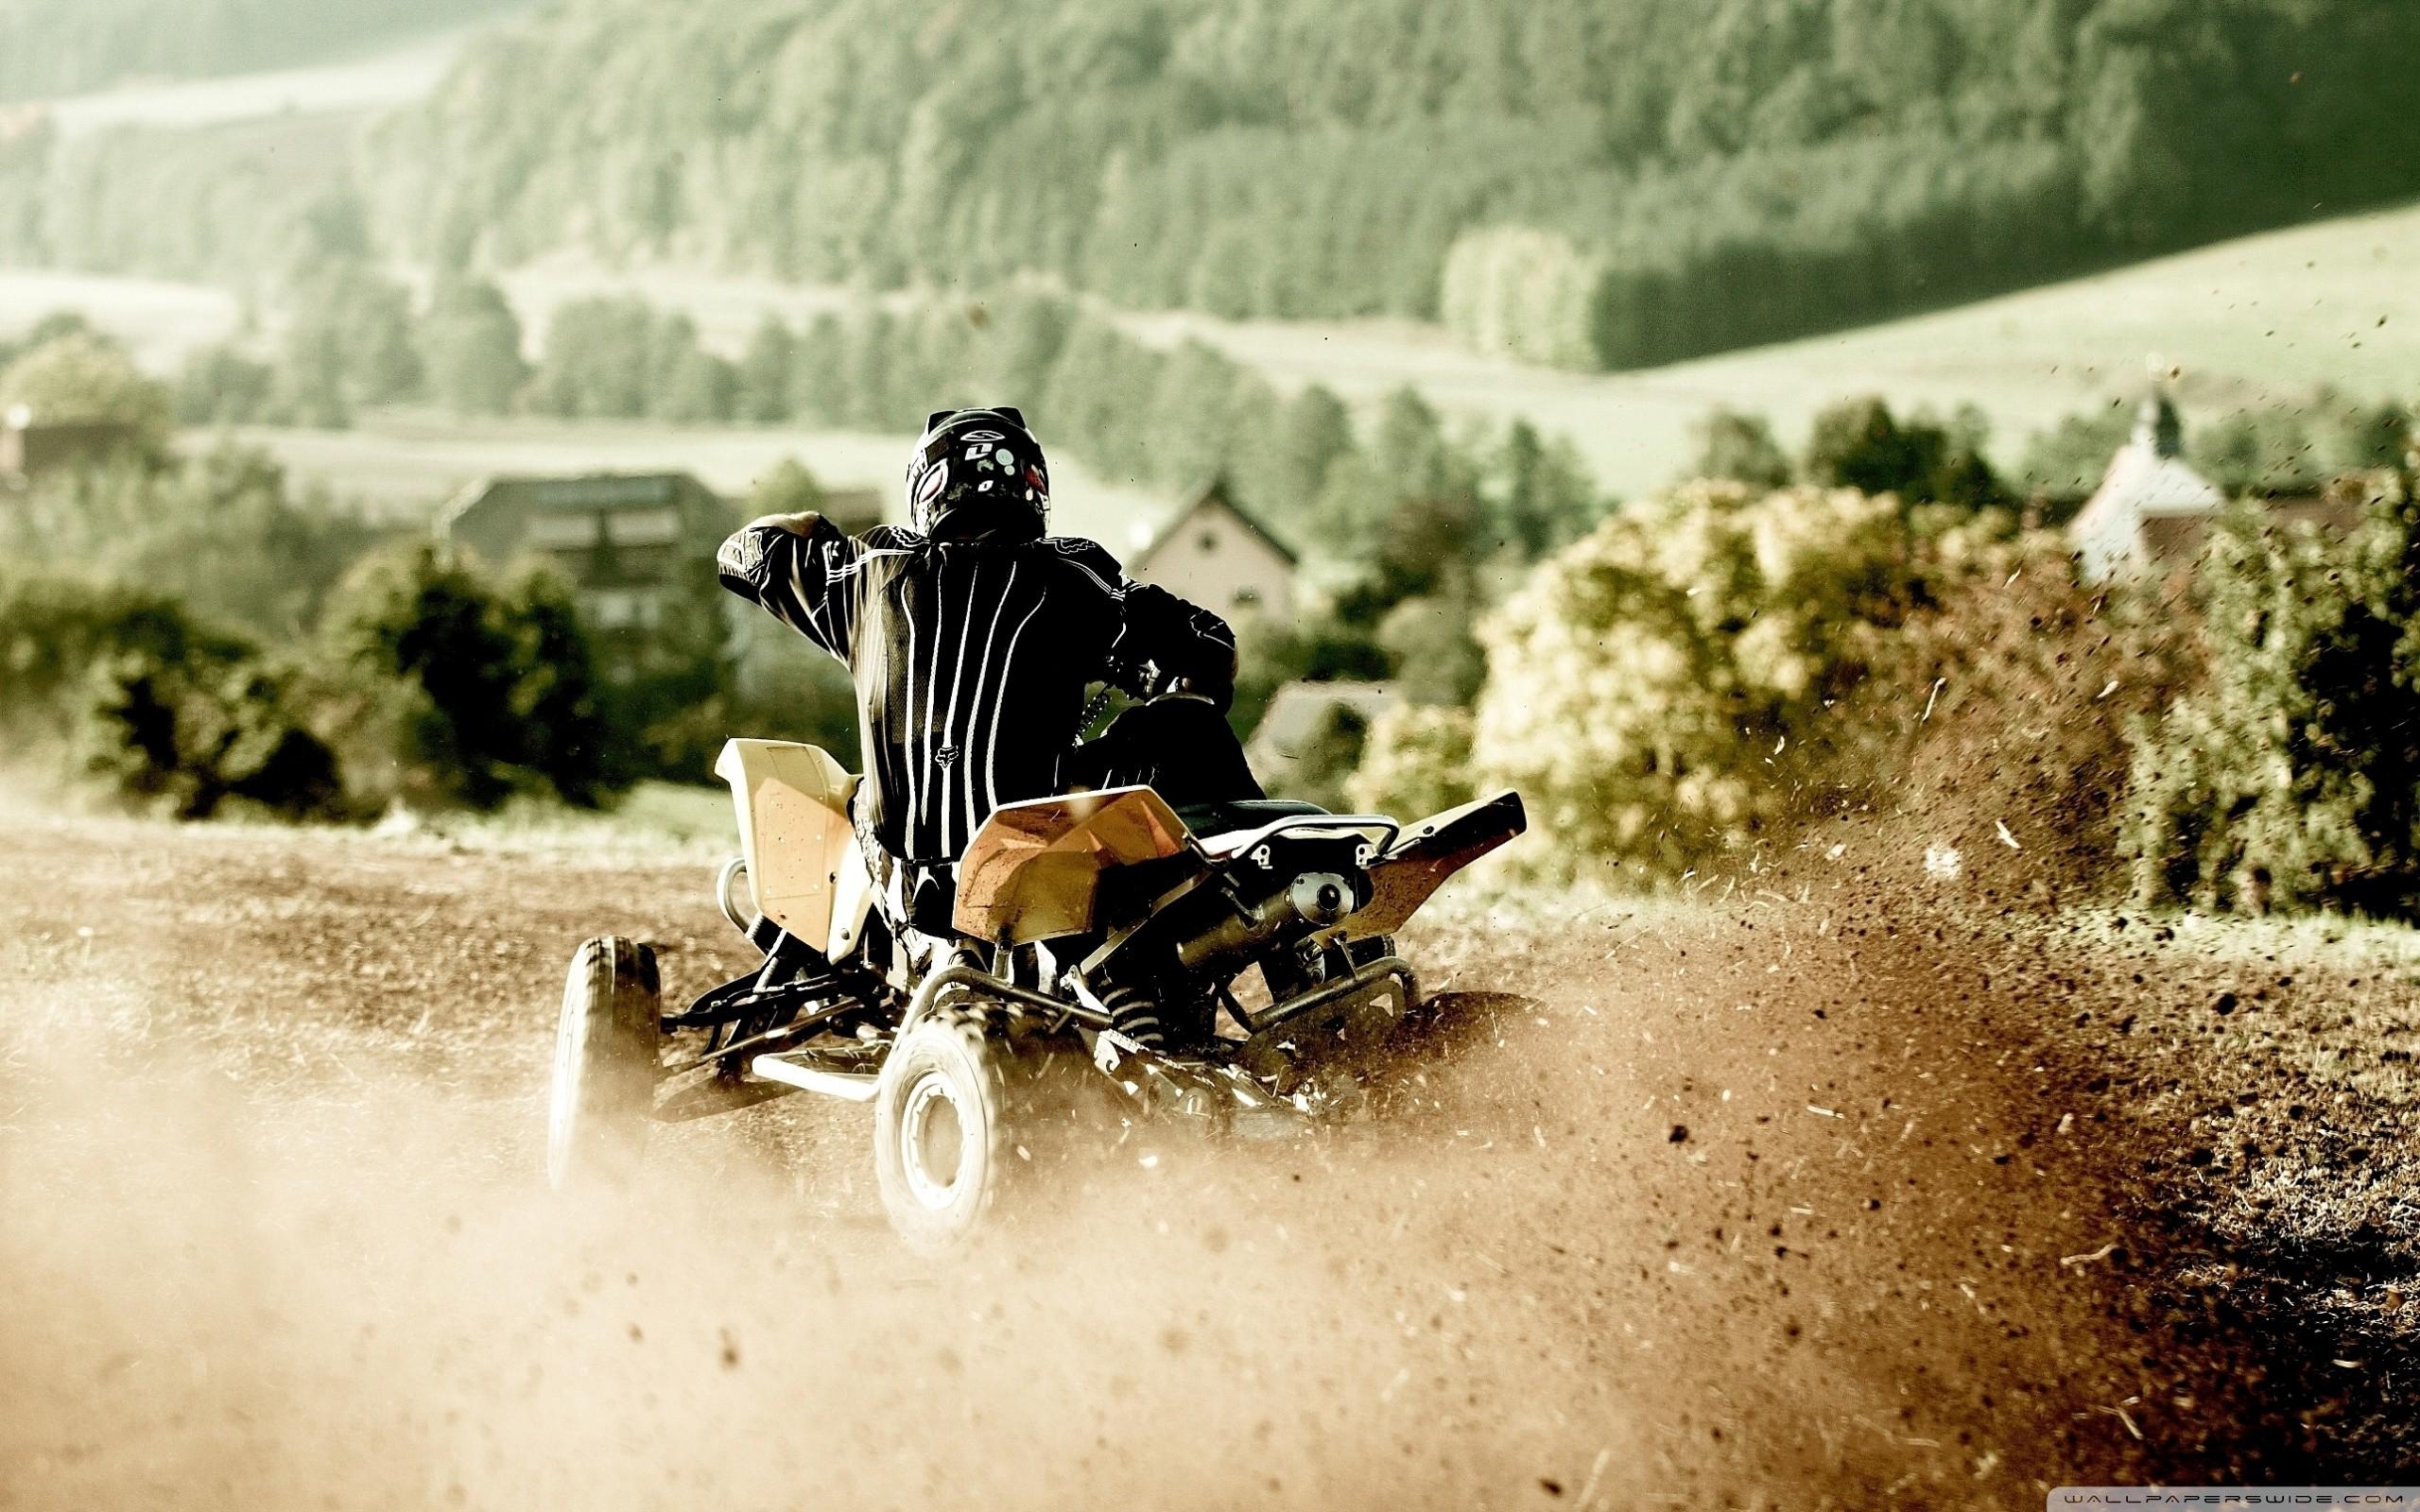 ATV Ride HD Wide Wallpaper for Widescreen